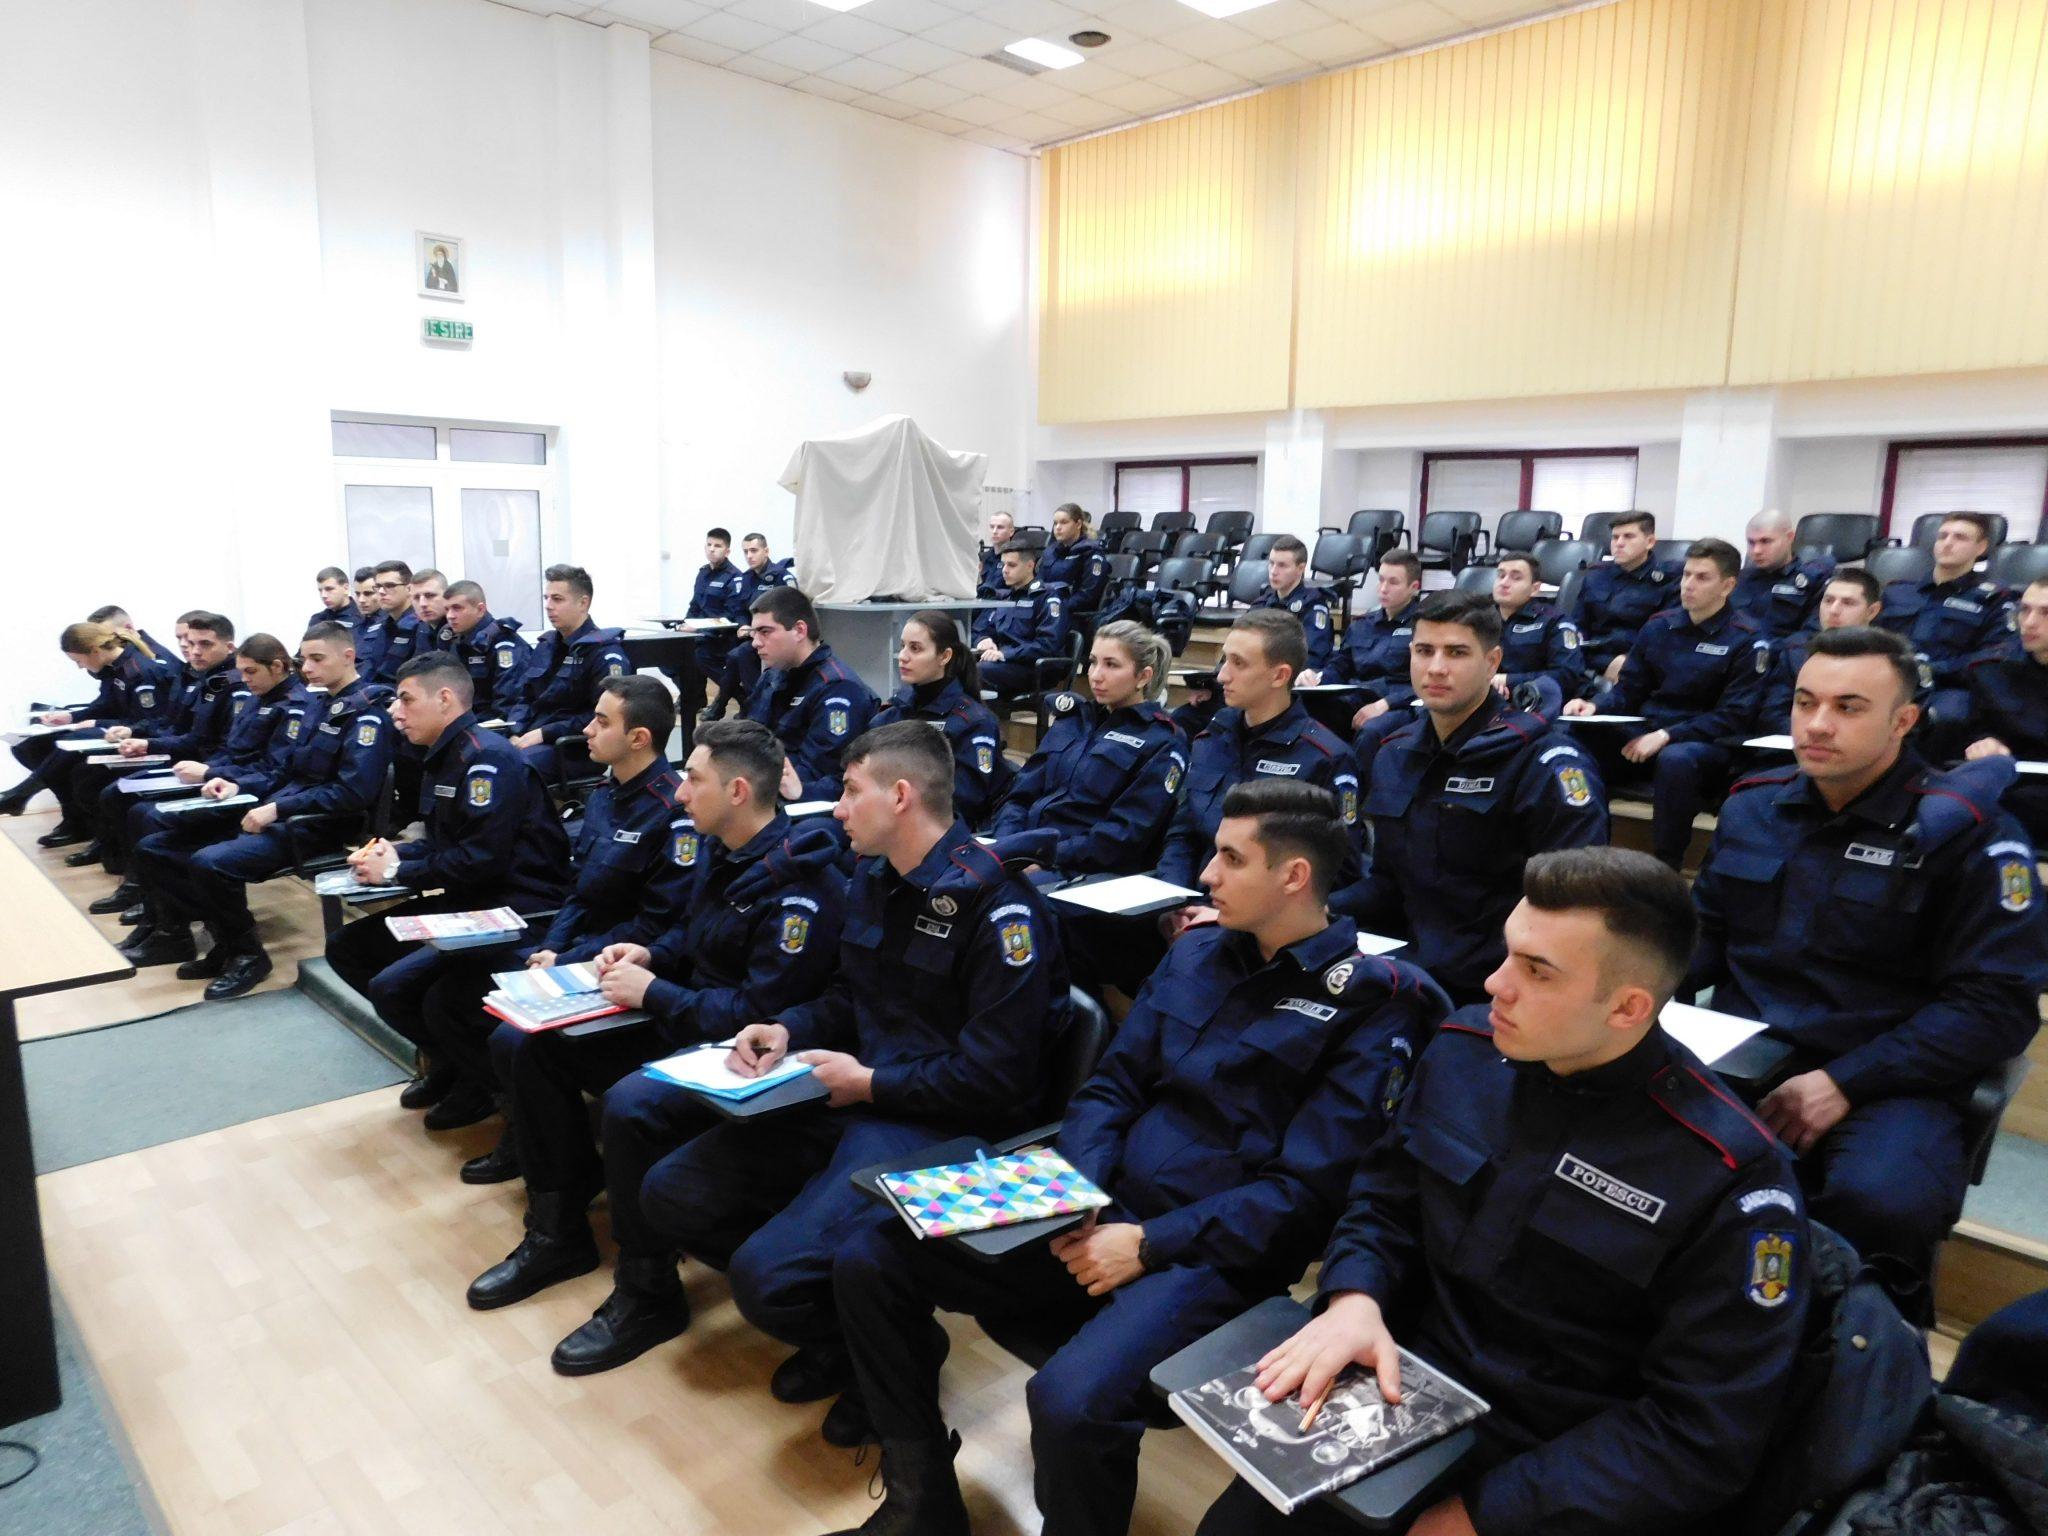 Viitori subofițeri, în practică la Jandarmeria Dolj